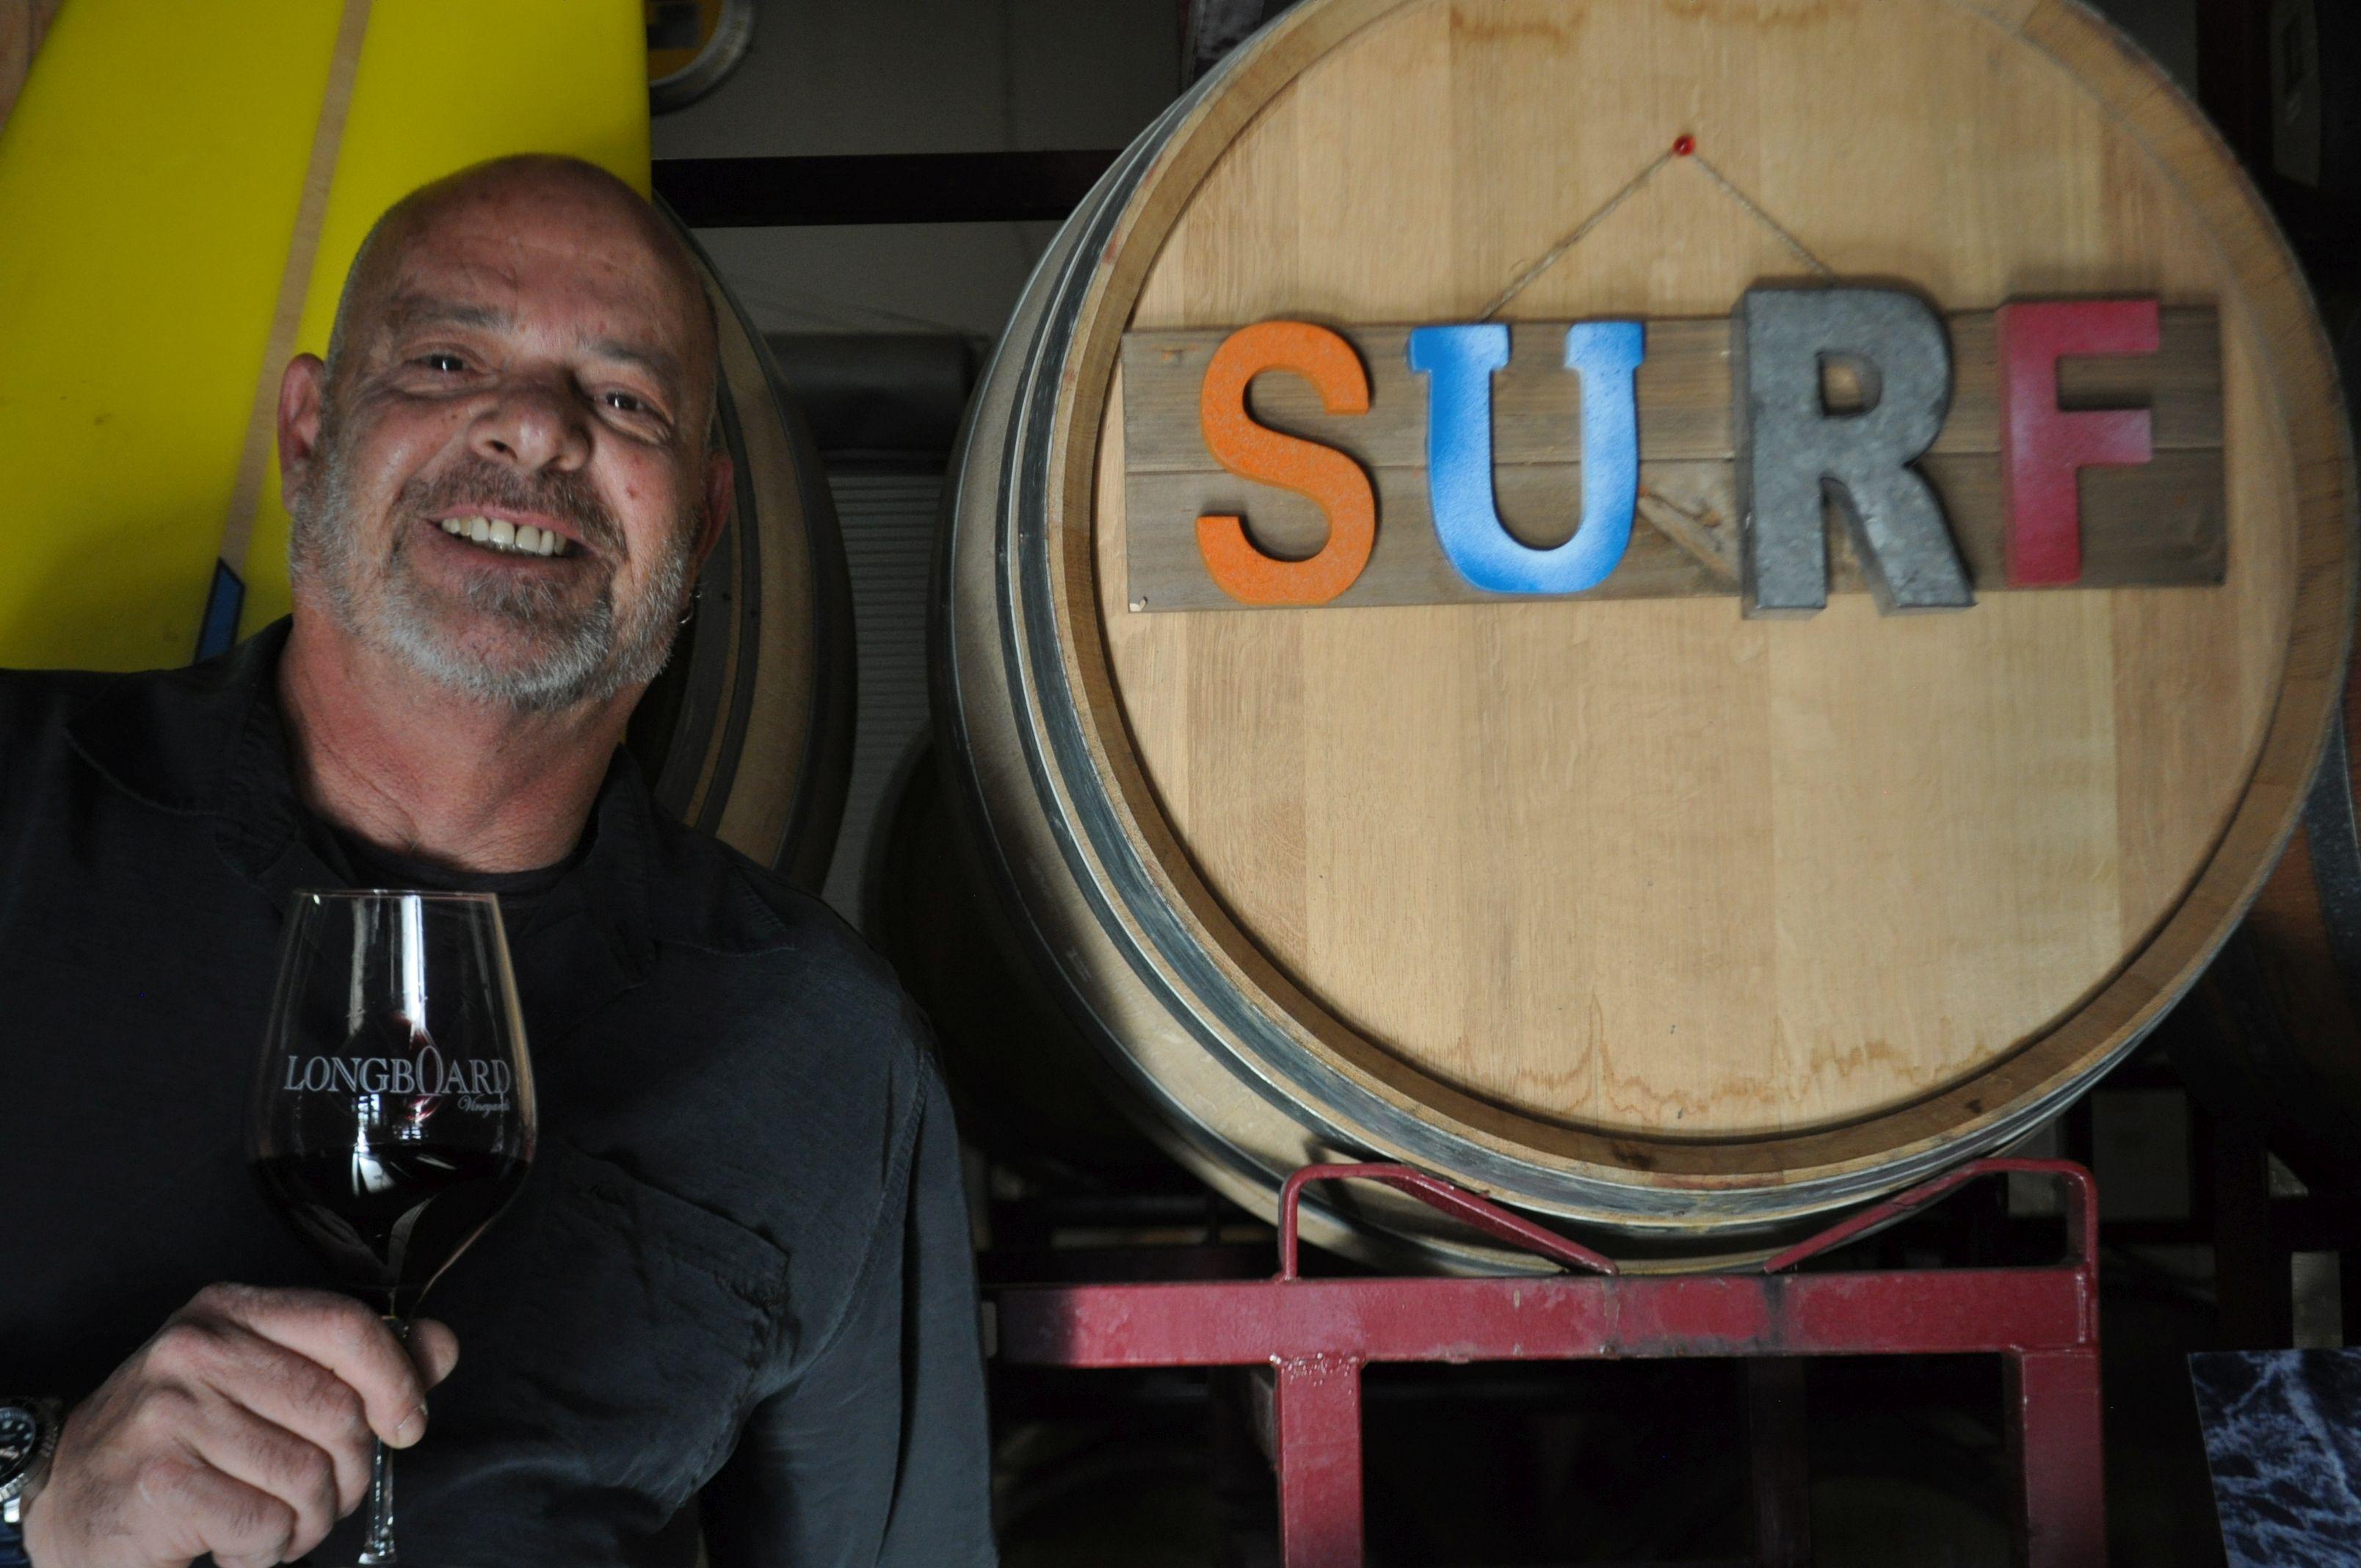 Oded Shakked at his Sonoma winery, Longboard Vineyards. (Courtesy Oded Shakked)